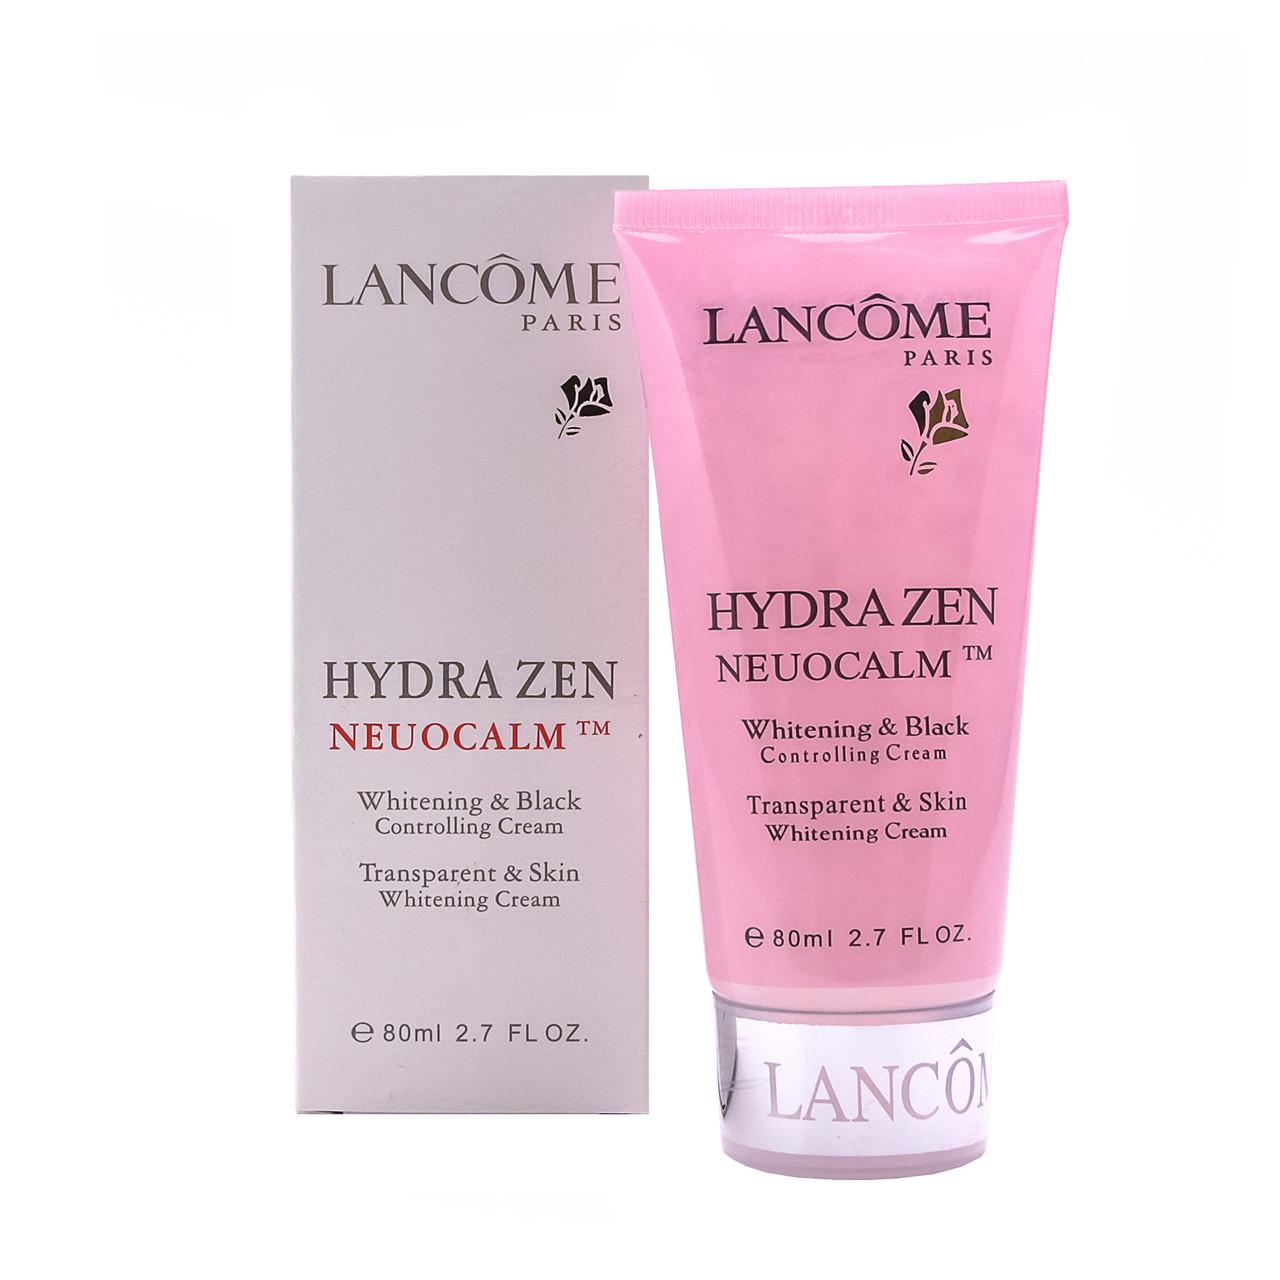 Пилинг для лица Lancome Hydra Zen Neuocalm